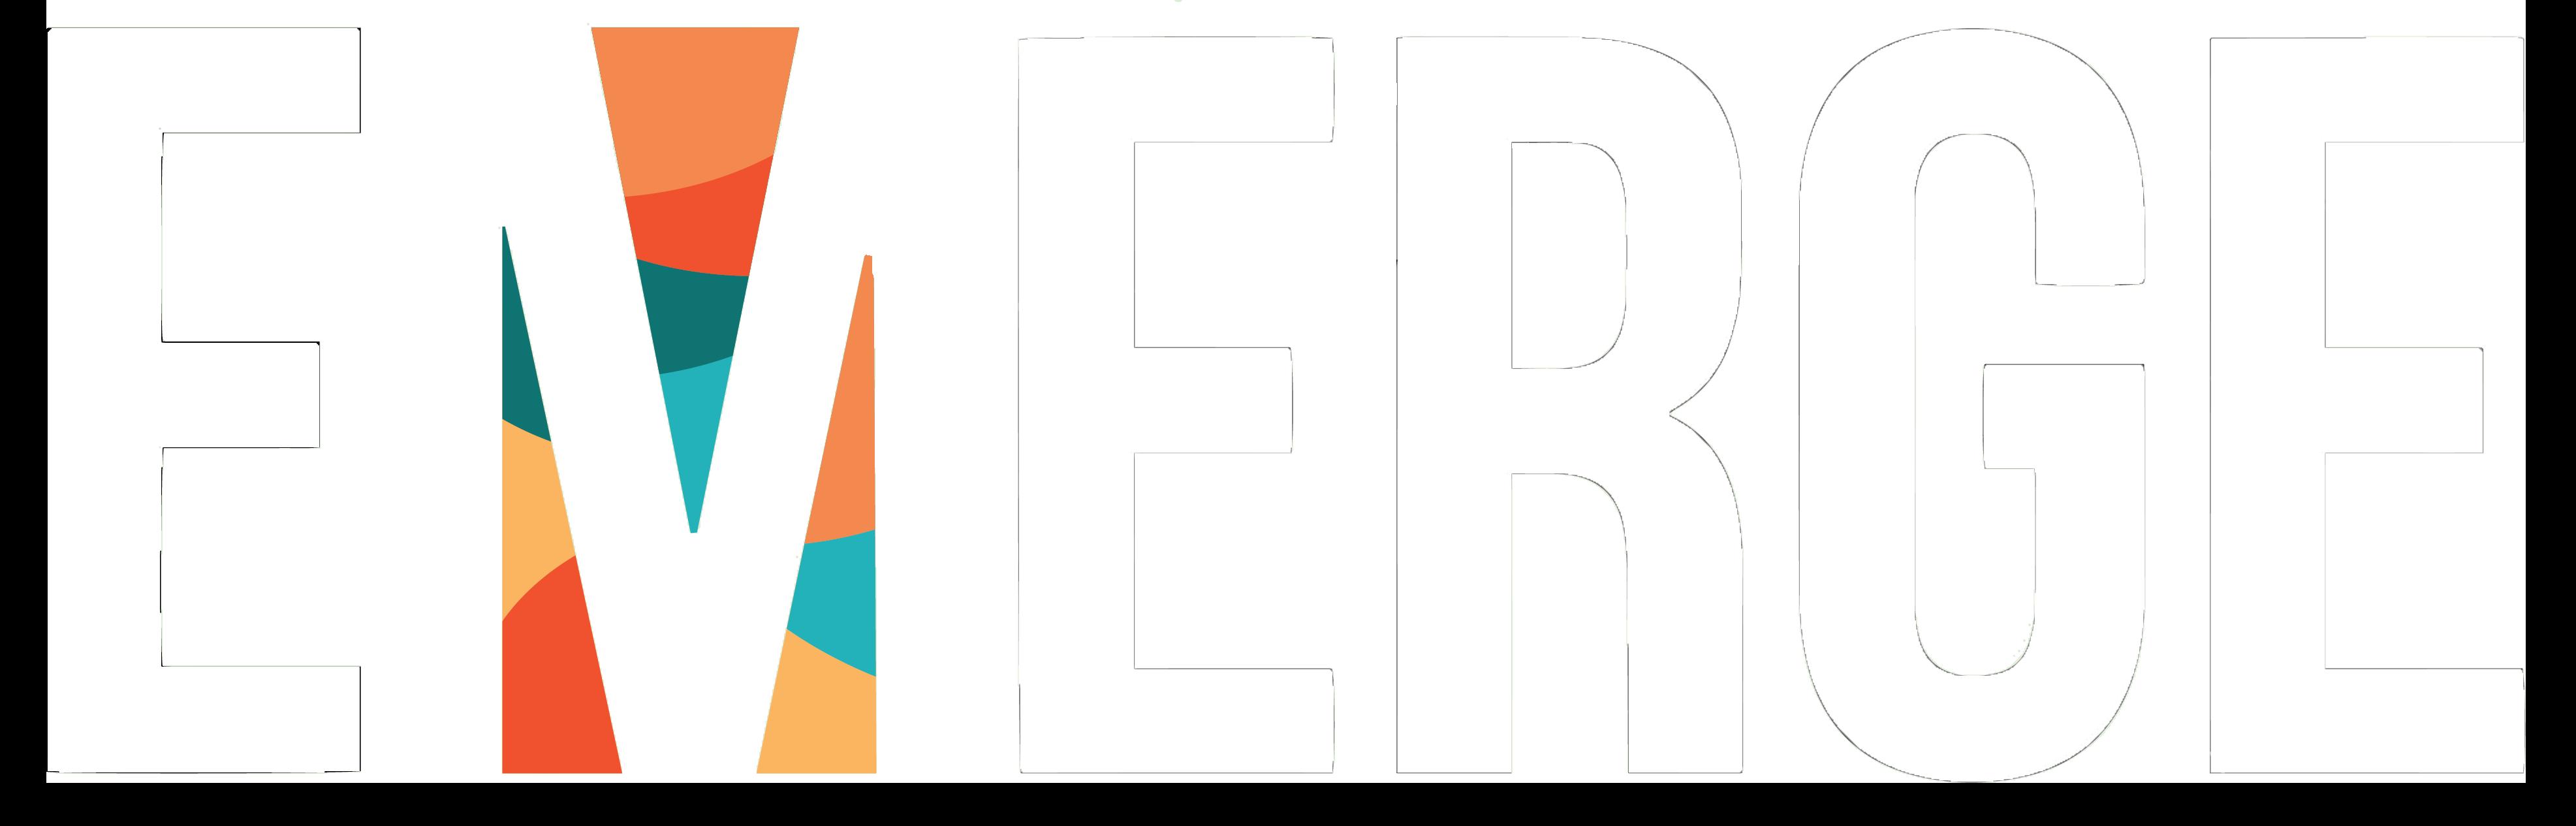 Emerge Magazine 2021 Mulitmedia